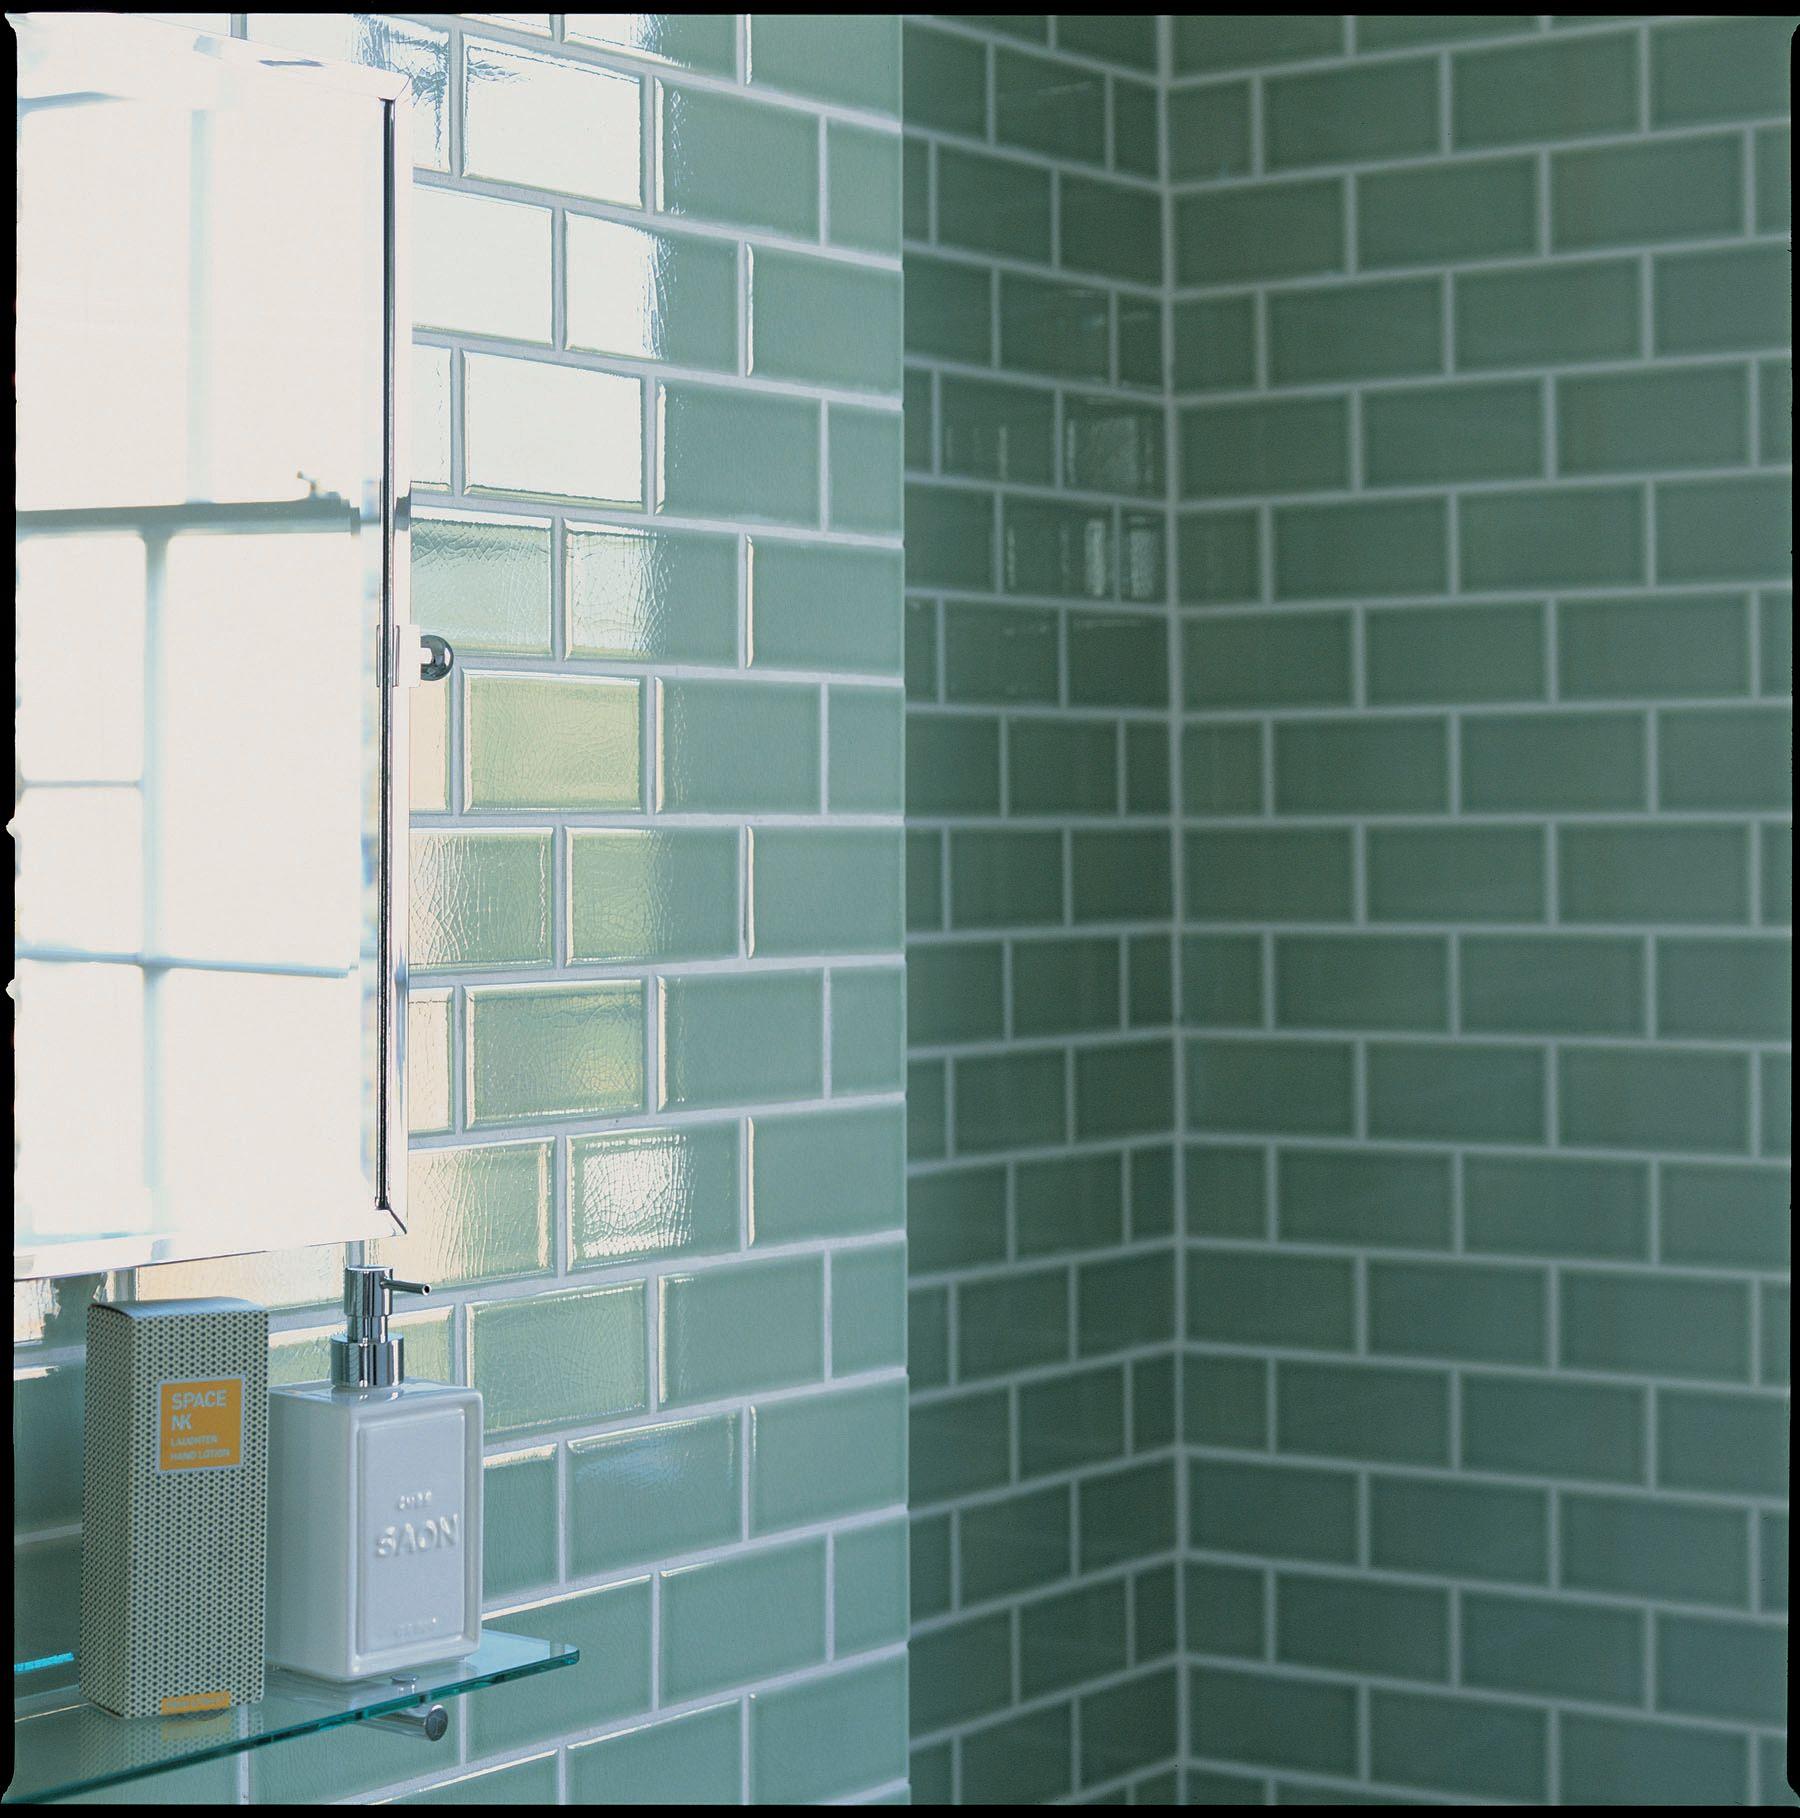 Green bathroom tiles